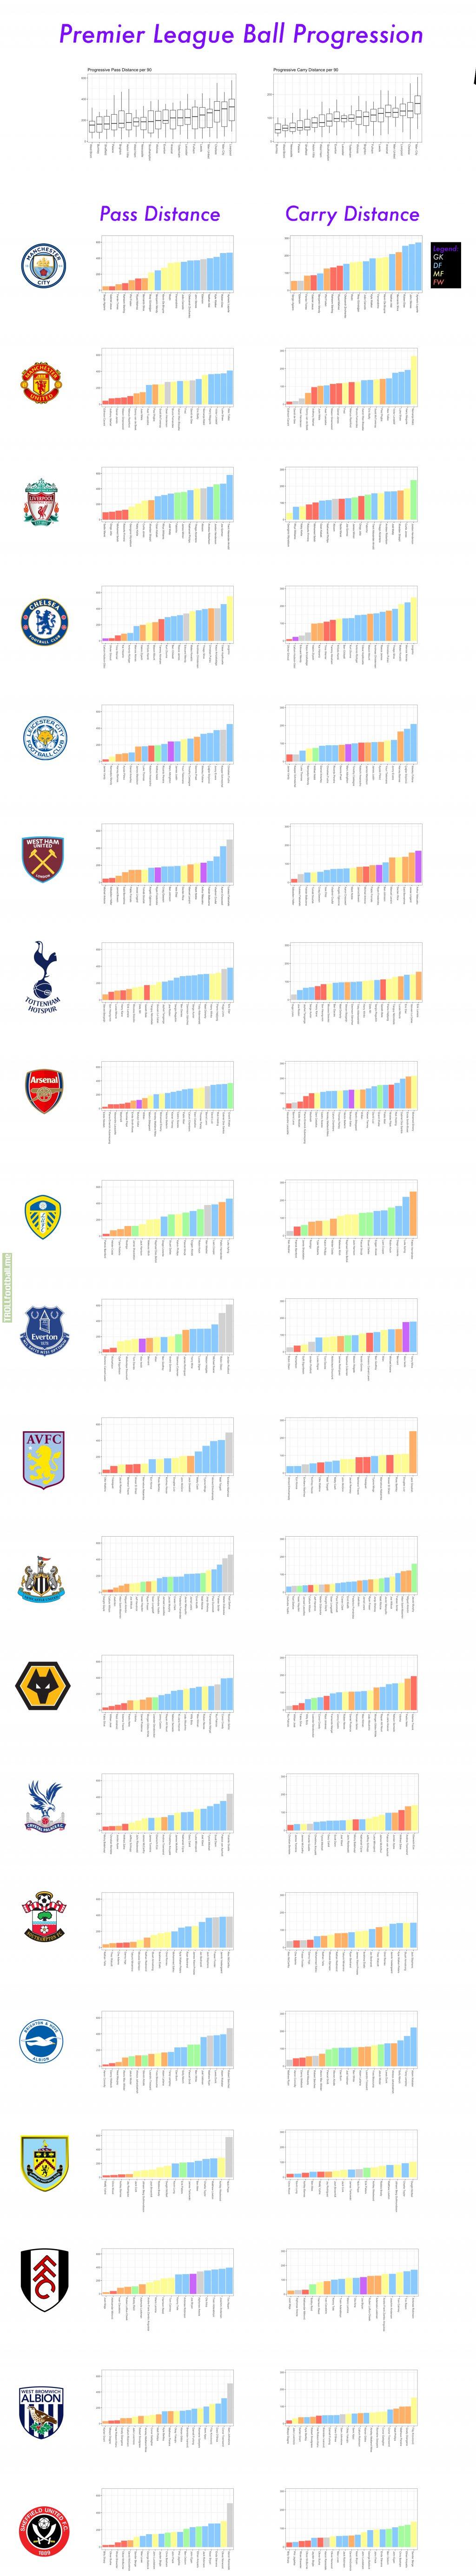 Premier League Team Ball Progression per player